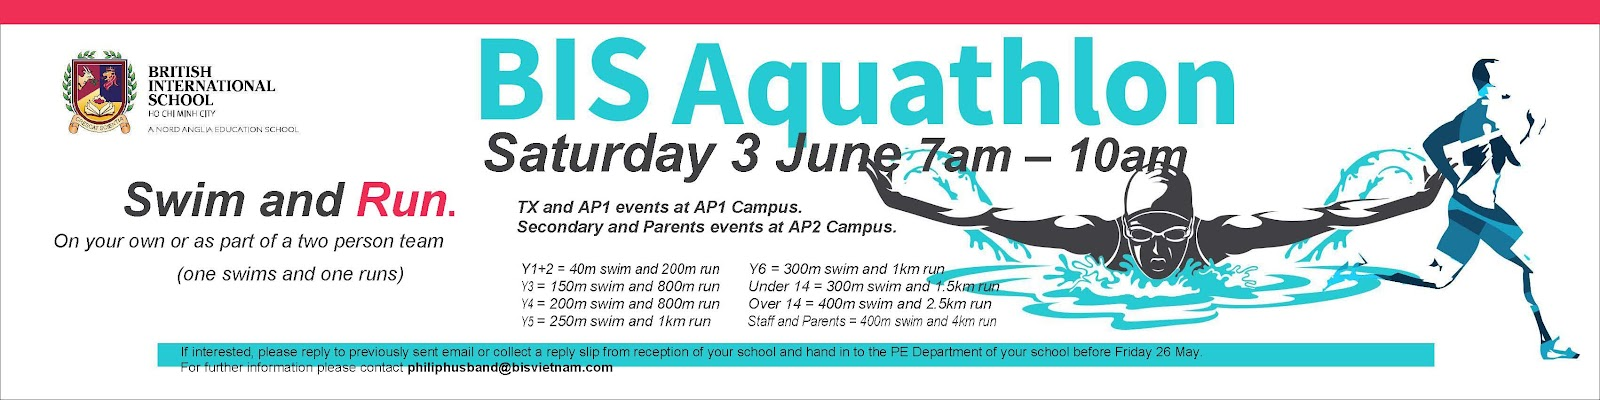 BIS Aquathlon e-poster.jpg